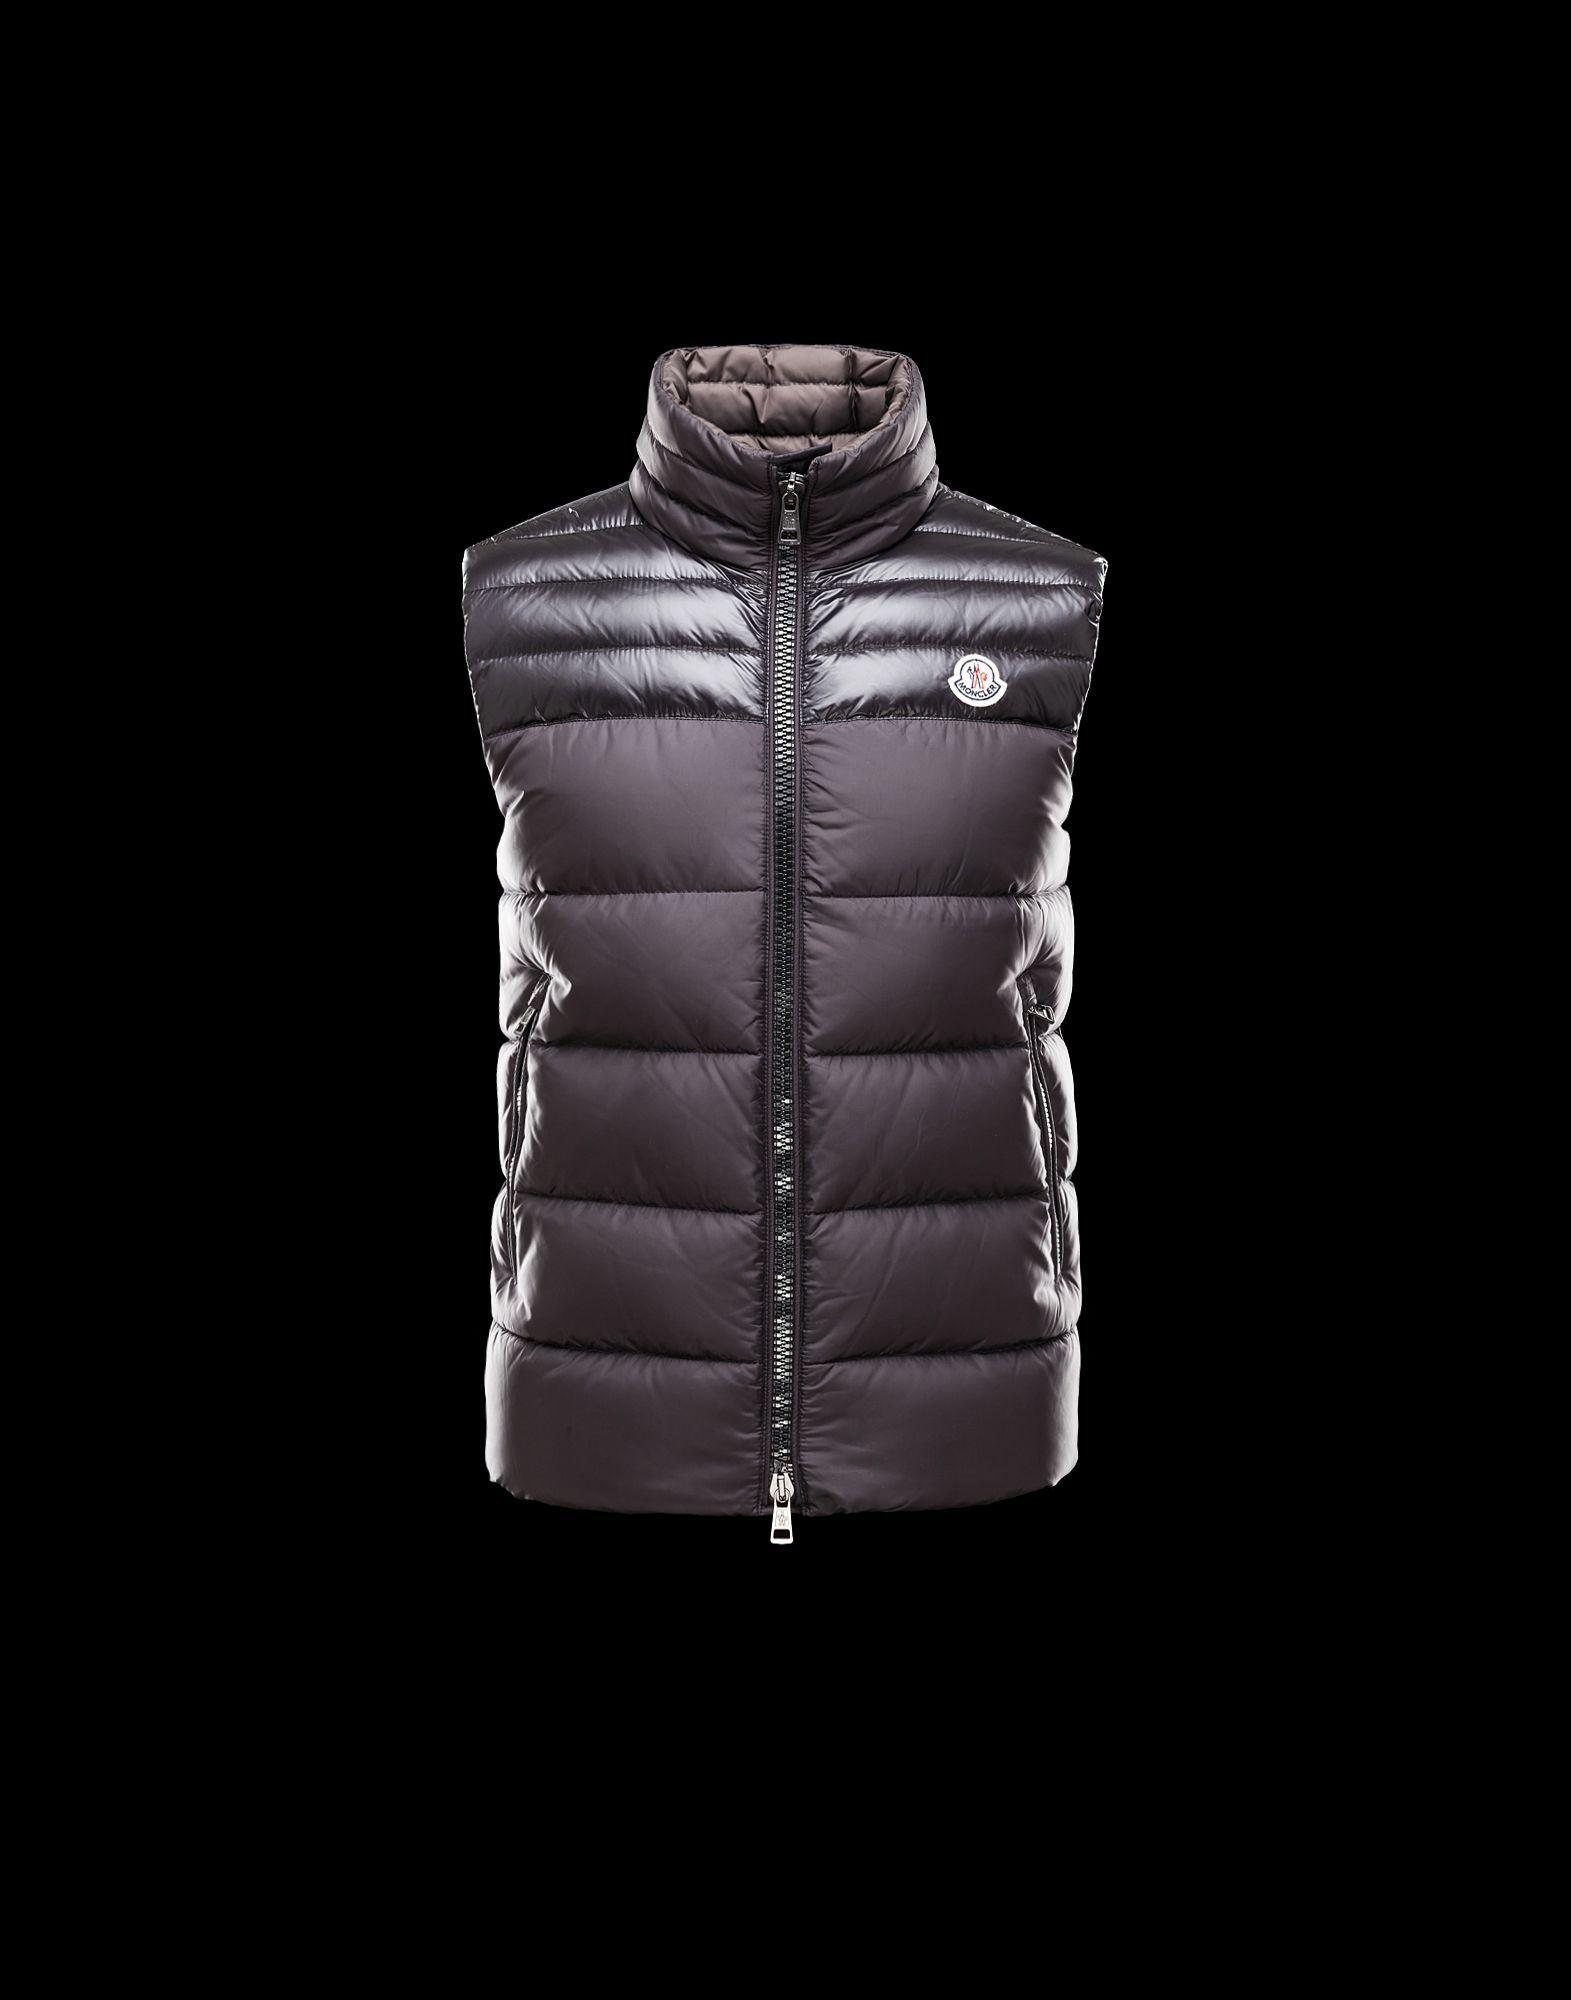 moncler 99 on new york fashion pinterest vest jackets and rh pinterest com